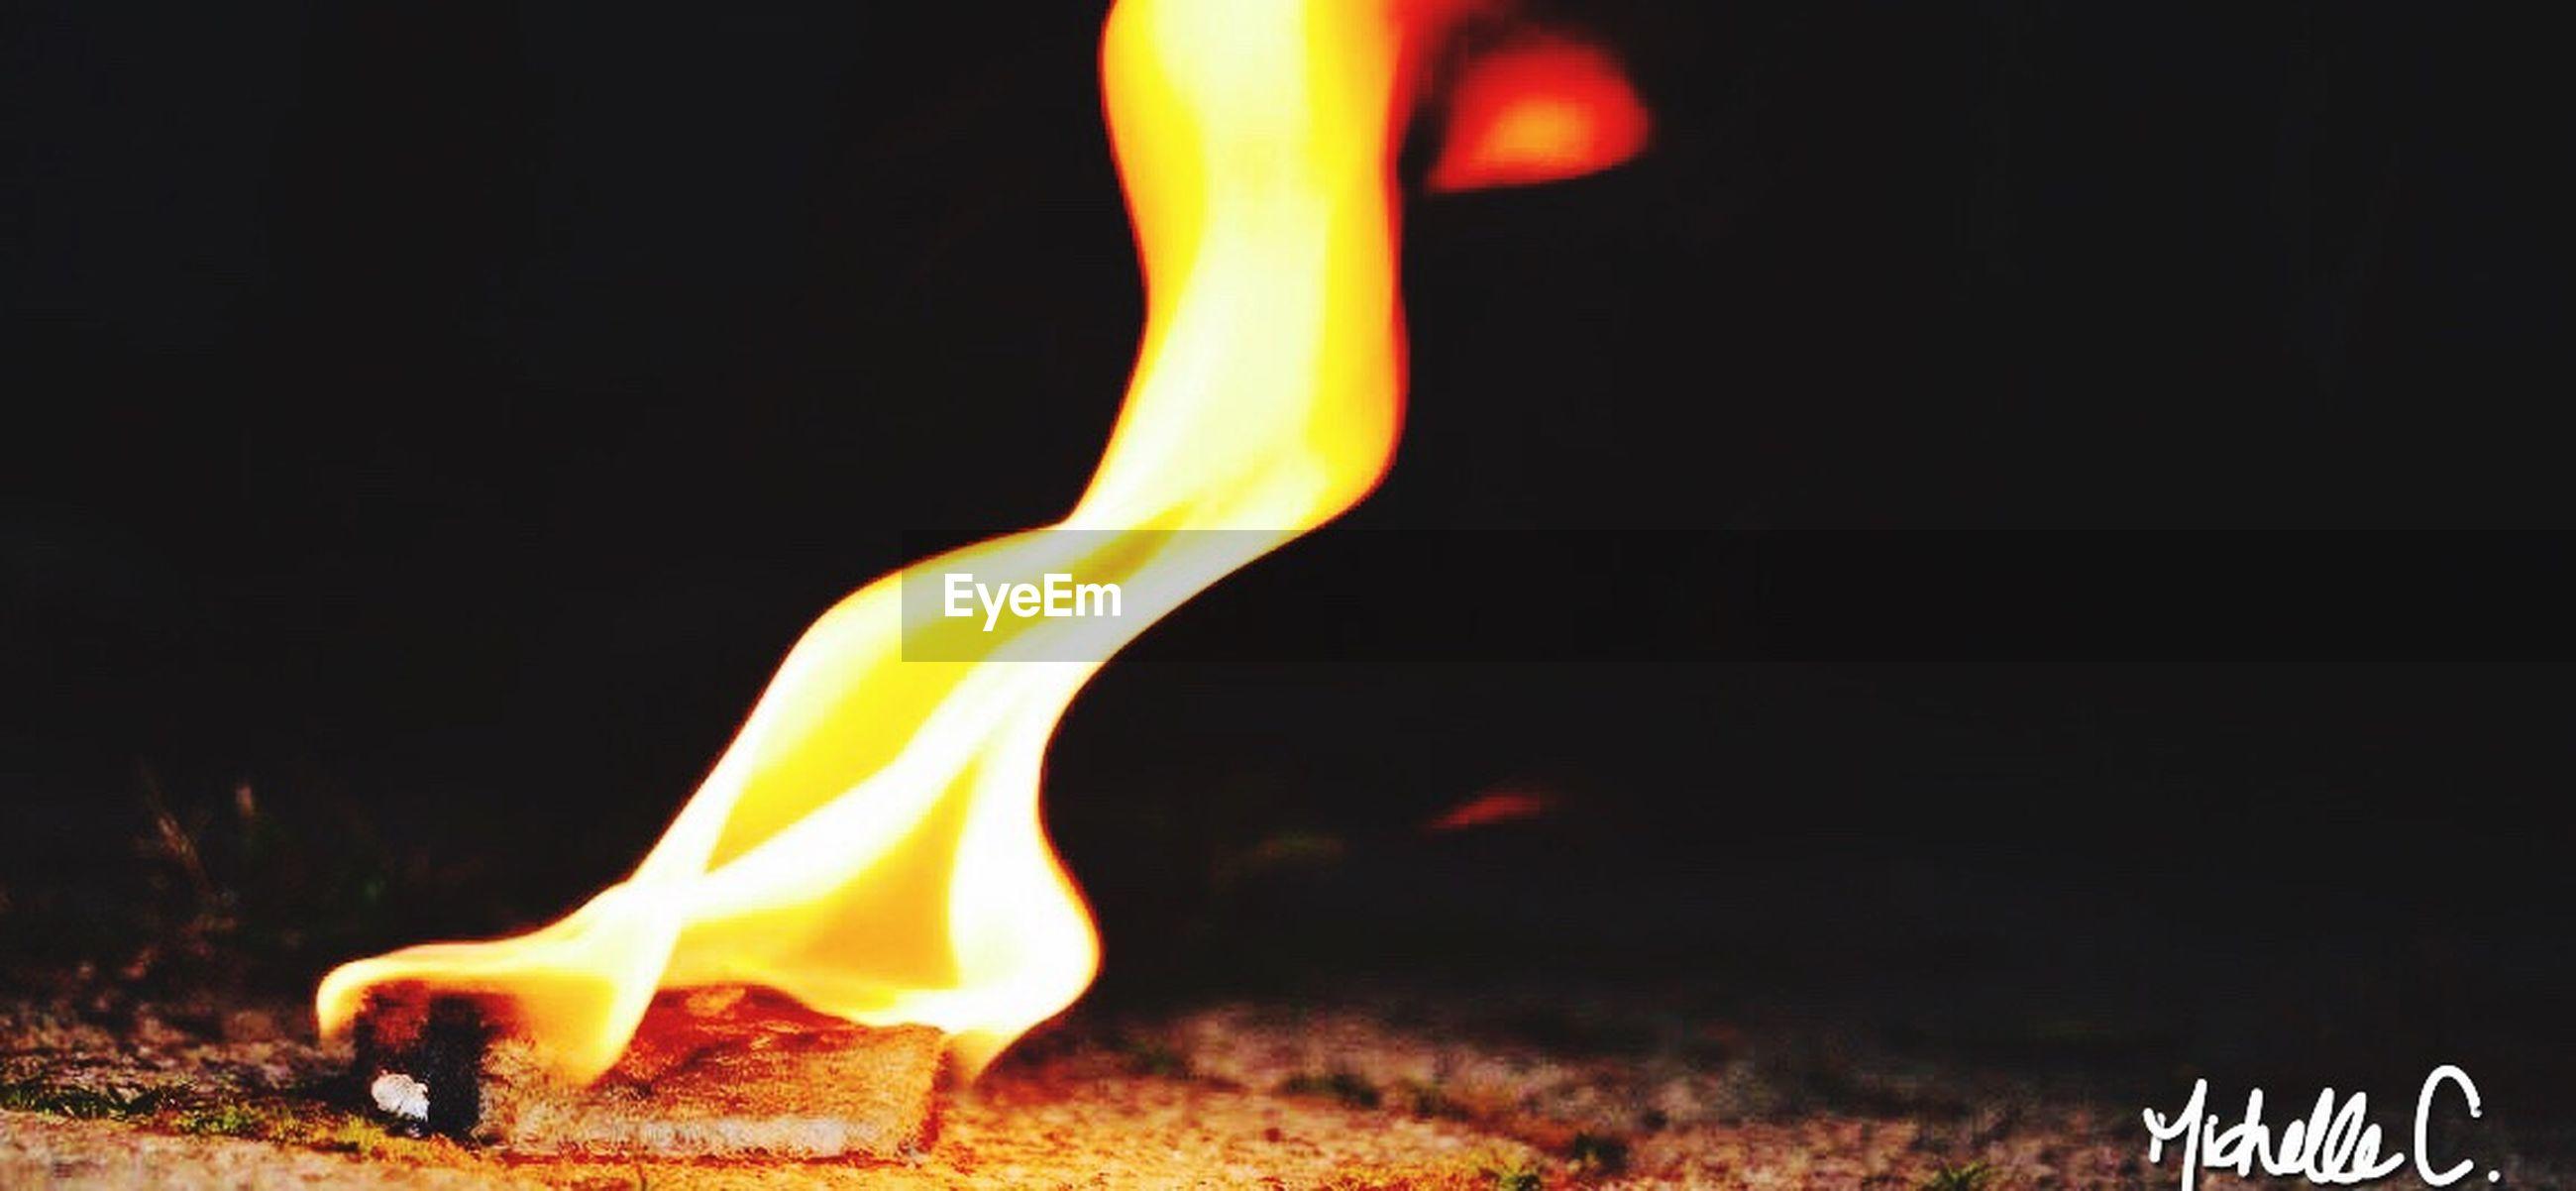 burning, flame, fire - natural phenomenon, heat - temperature, night, glowing, fire, black background, close-up, bonfire, dark, copy space, illuminated, studio shot, yellow, motion, light - natural phenomenon, heat, campfire, no people